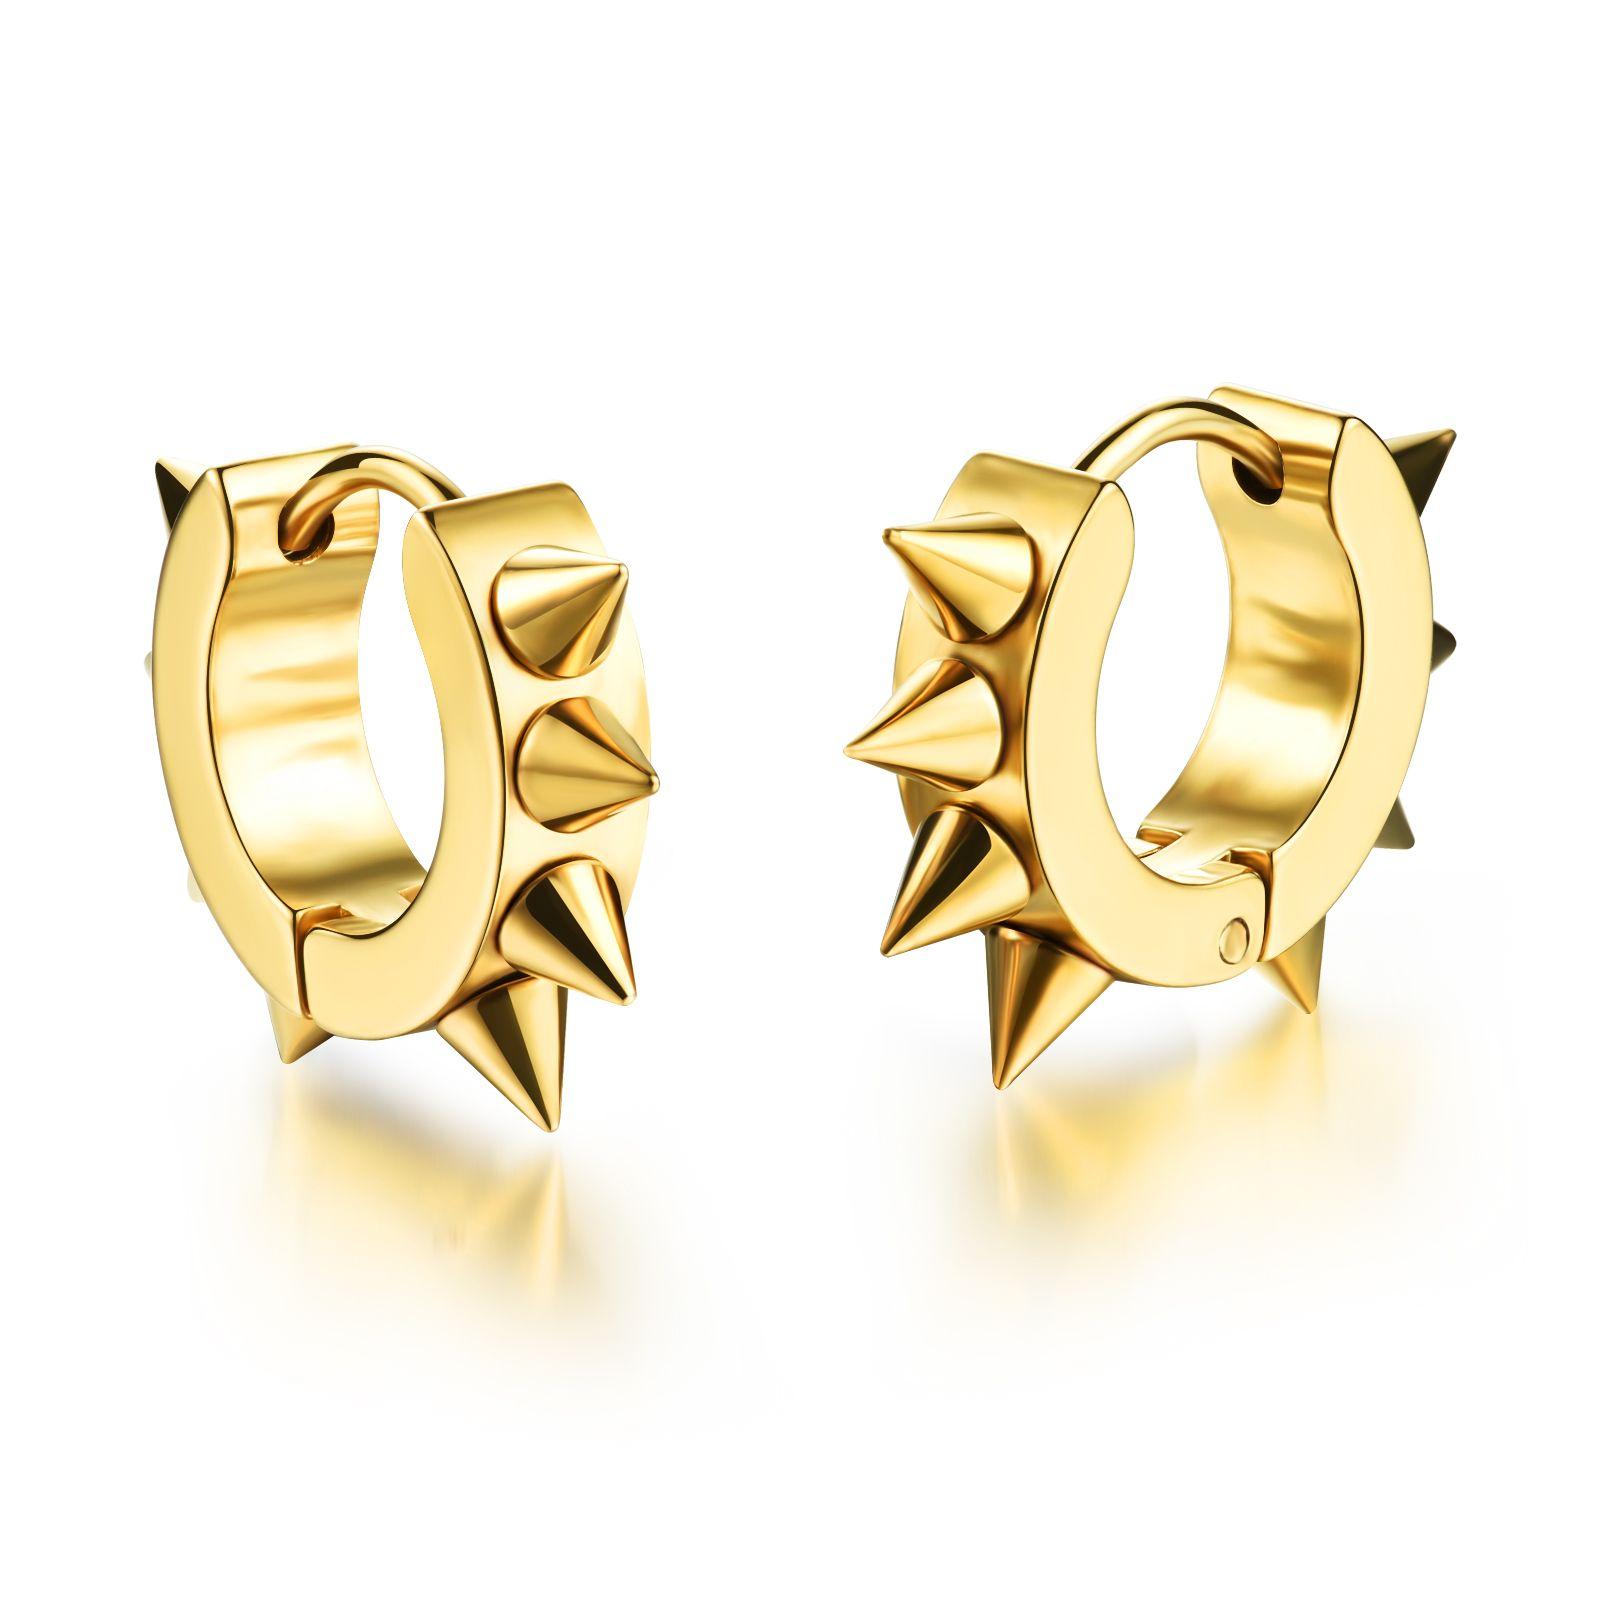 Fashion Stainless Steel Spike Rivet Hoop Huggie Earrings Punk Rock Hip Hop Mens Jewelry